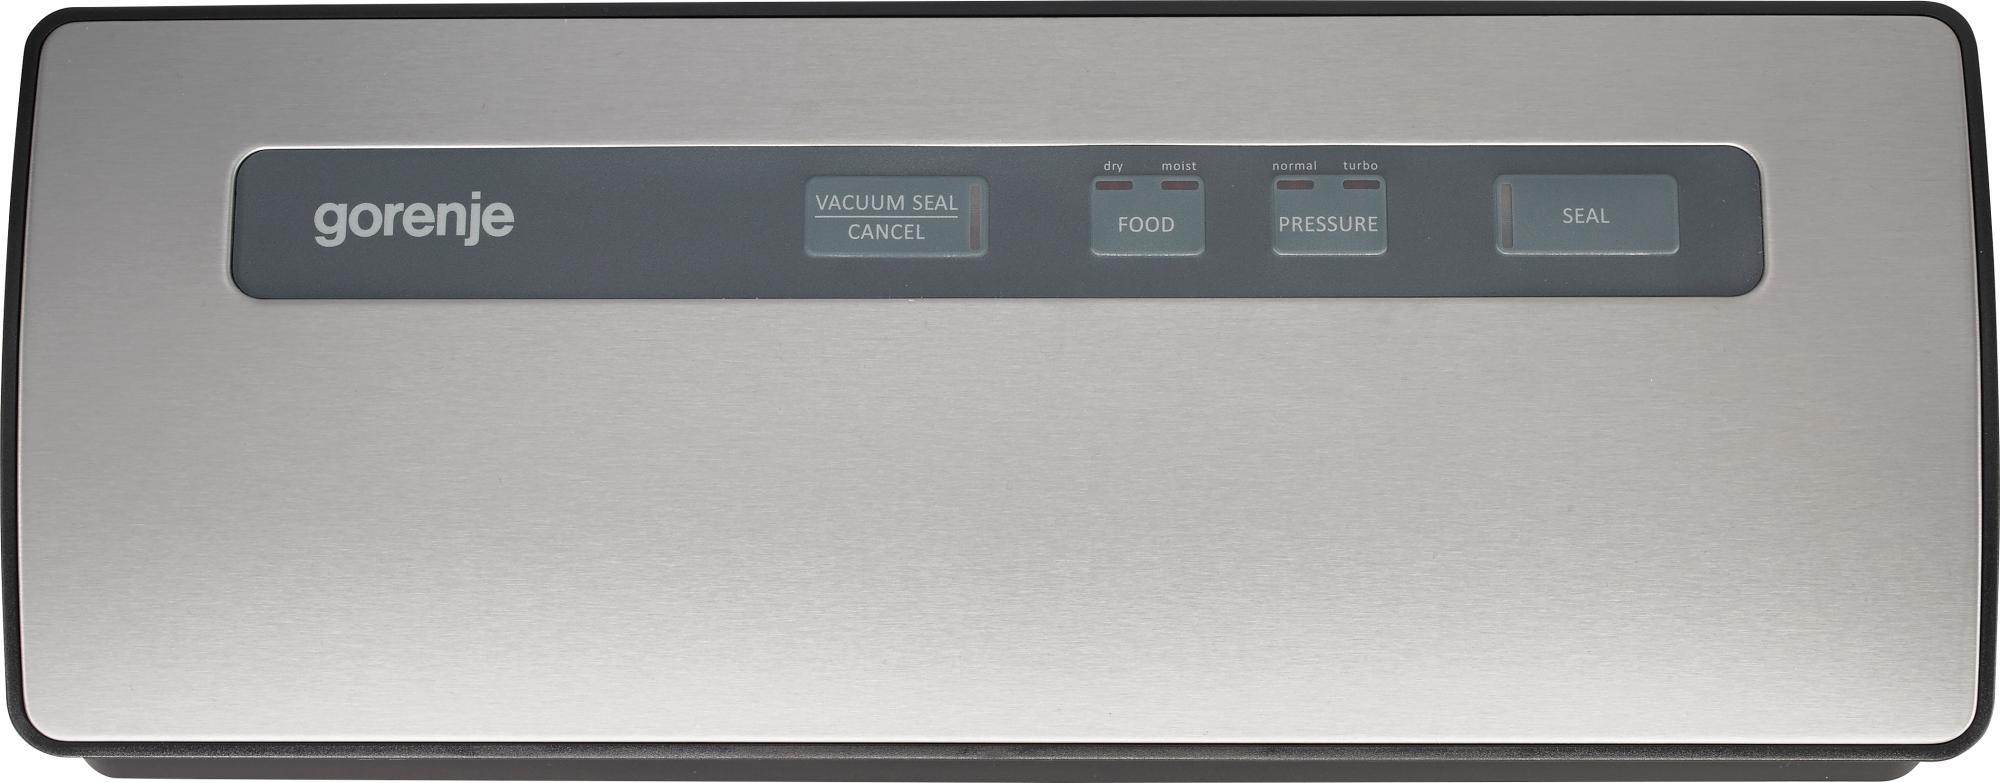 Aparat de vidat/sigilat Gorenje VS120E, 120W